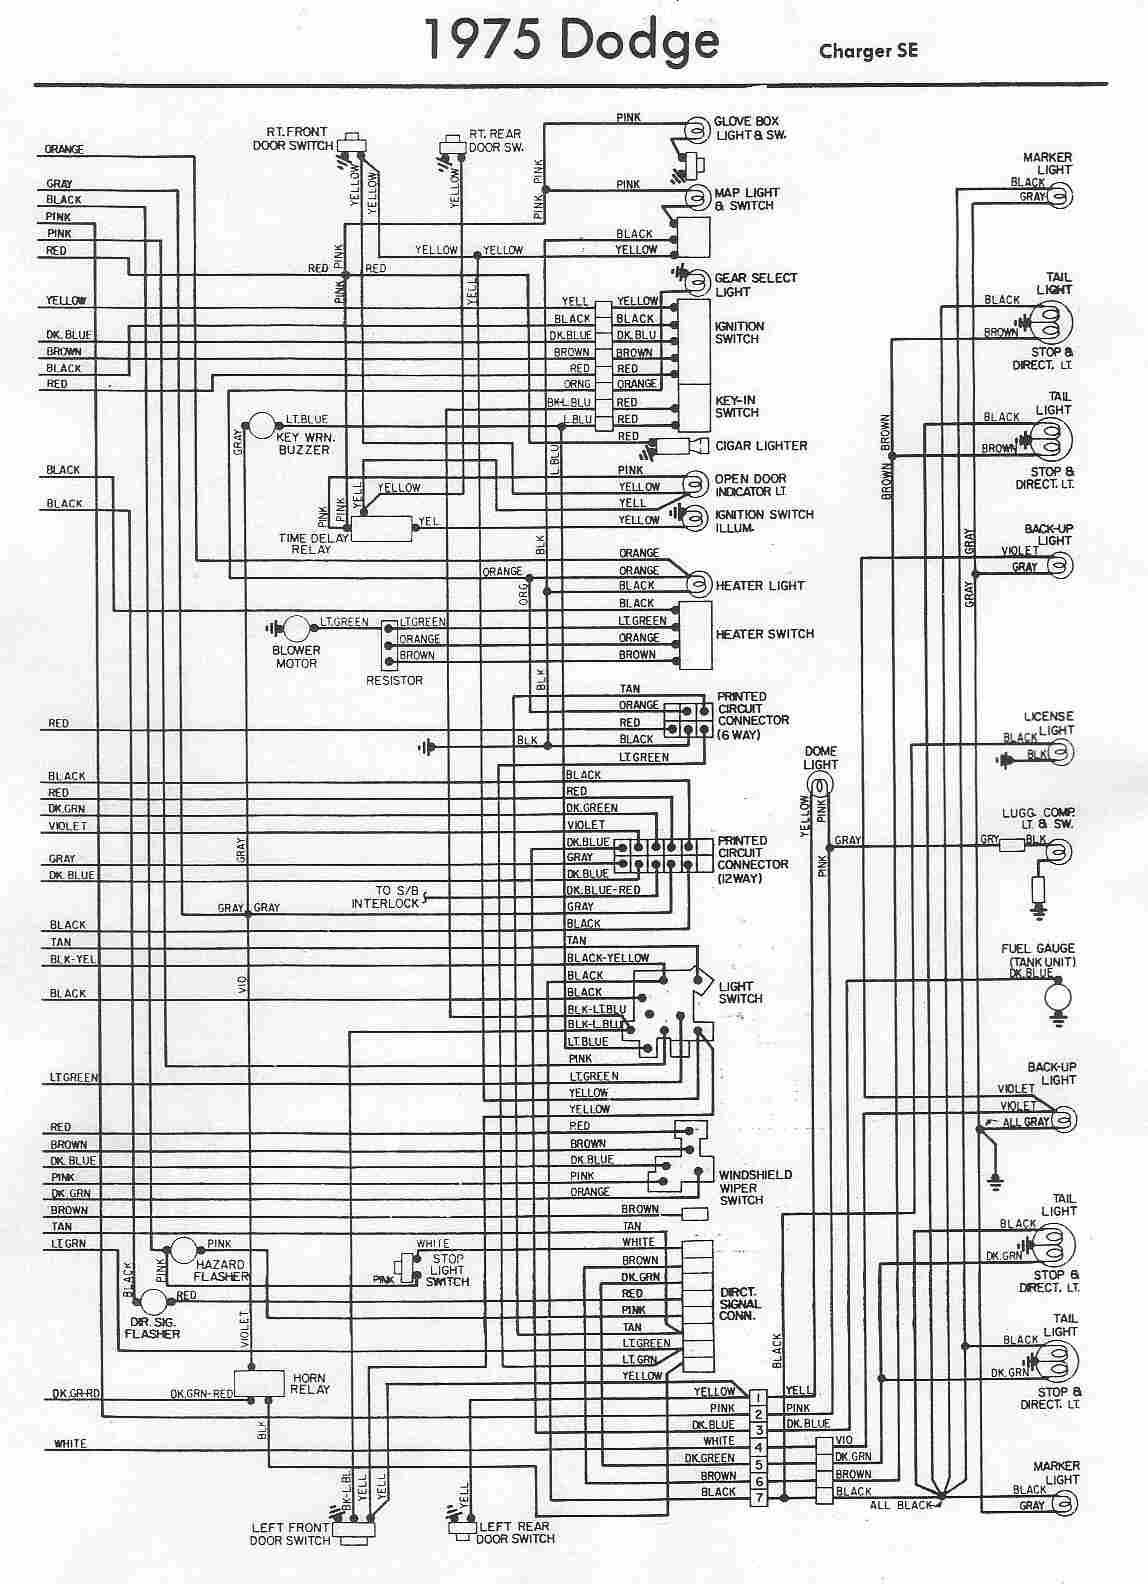 hight resolution of 1975 dodge wiring diagram wiring diagram for you1975 dodge wiring diagram 4